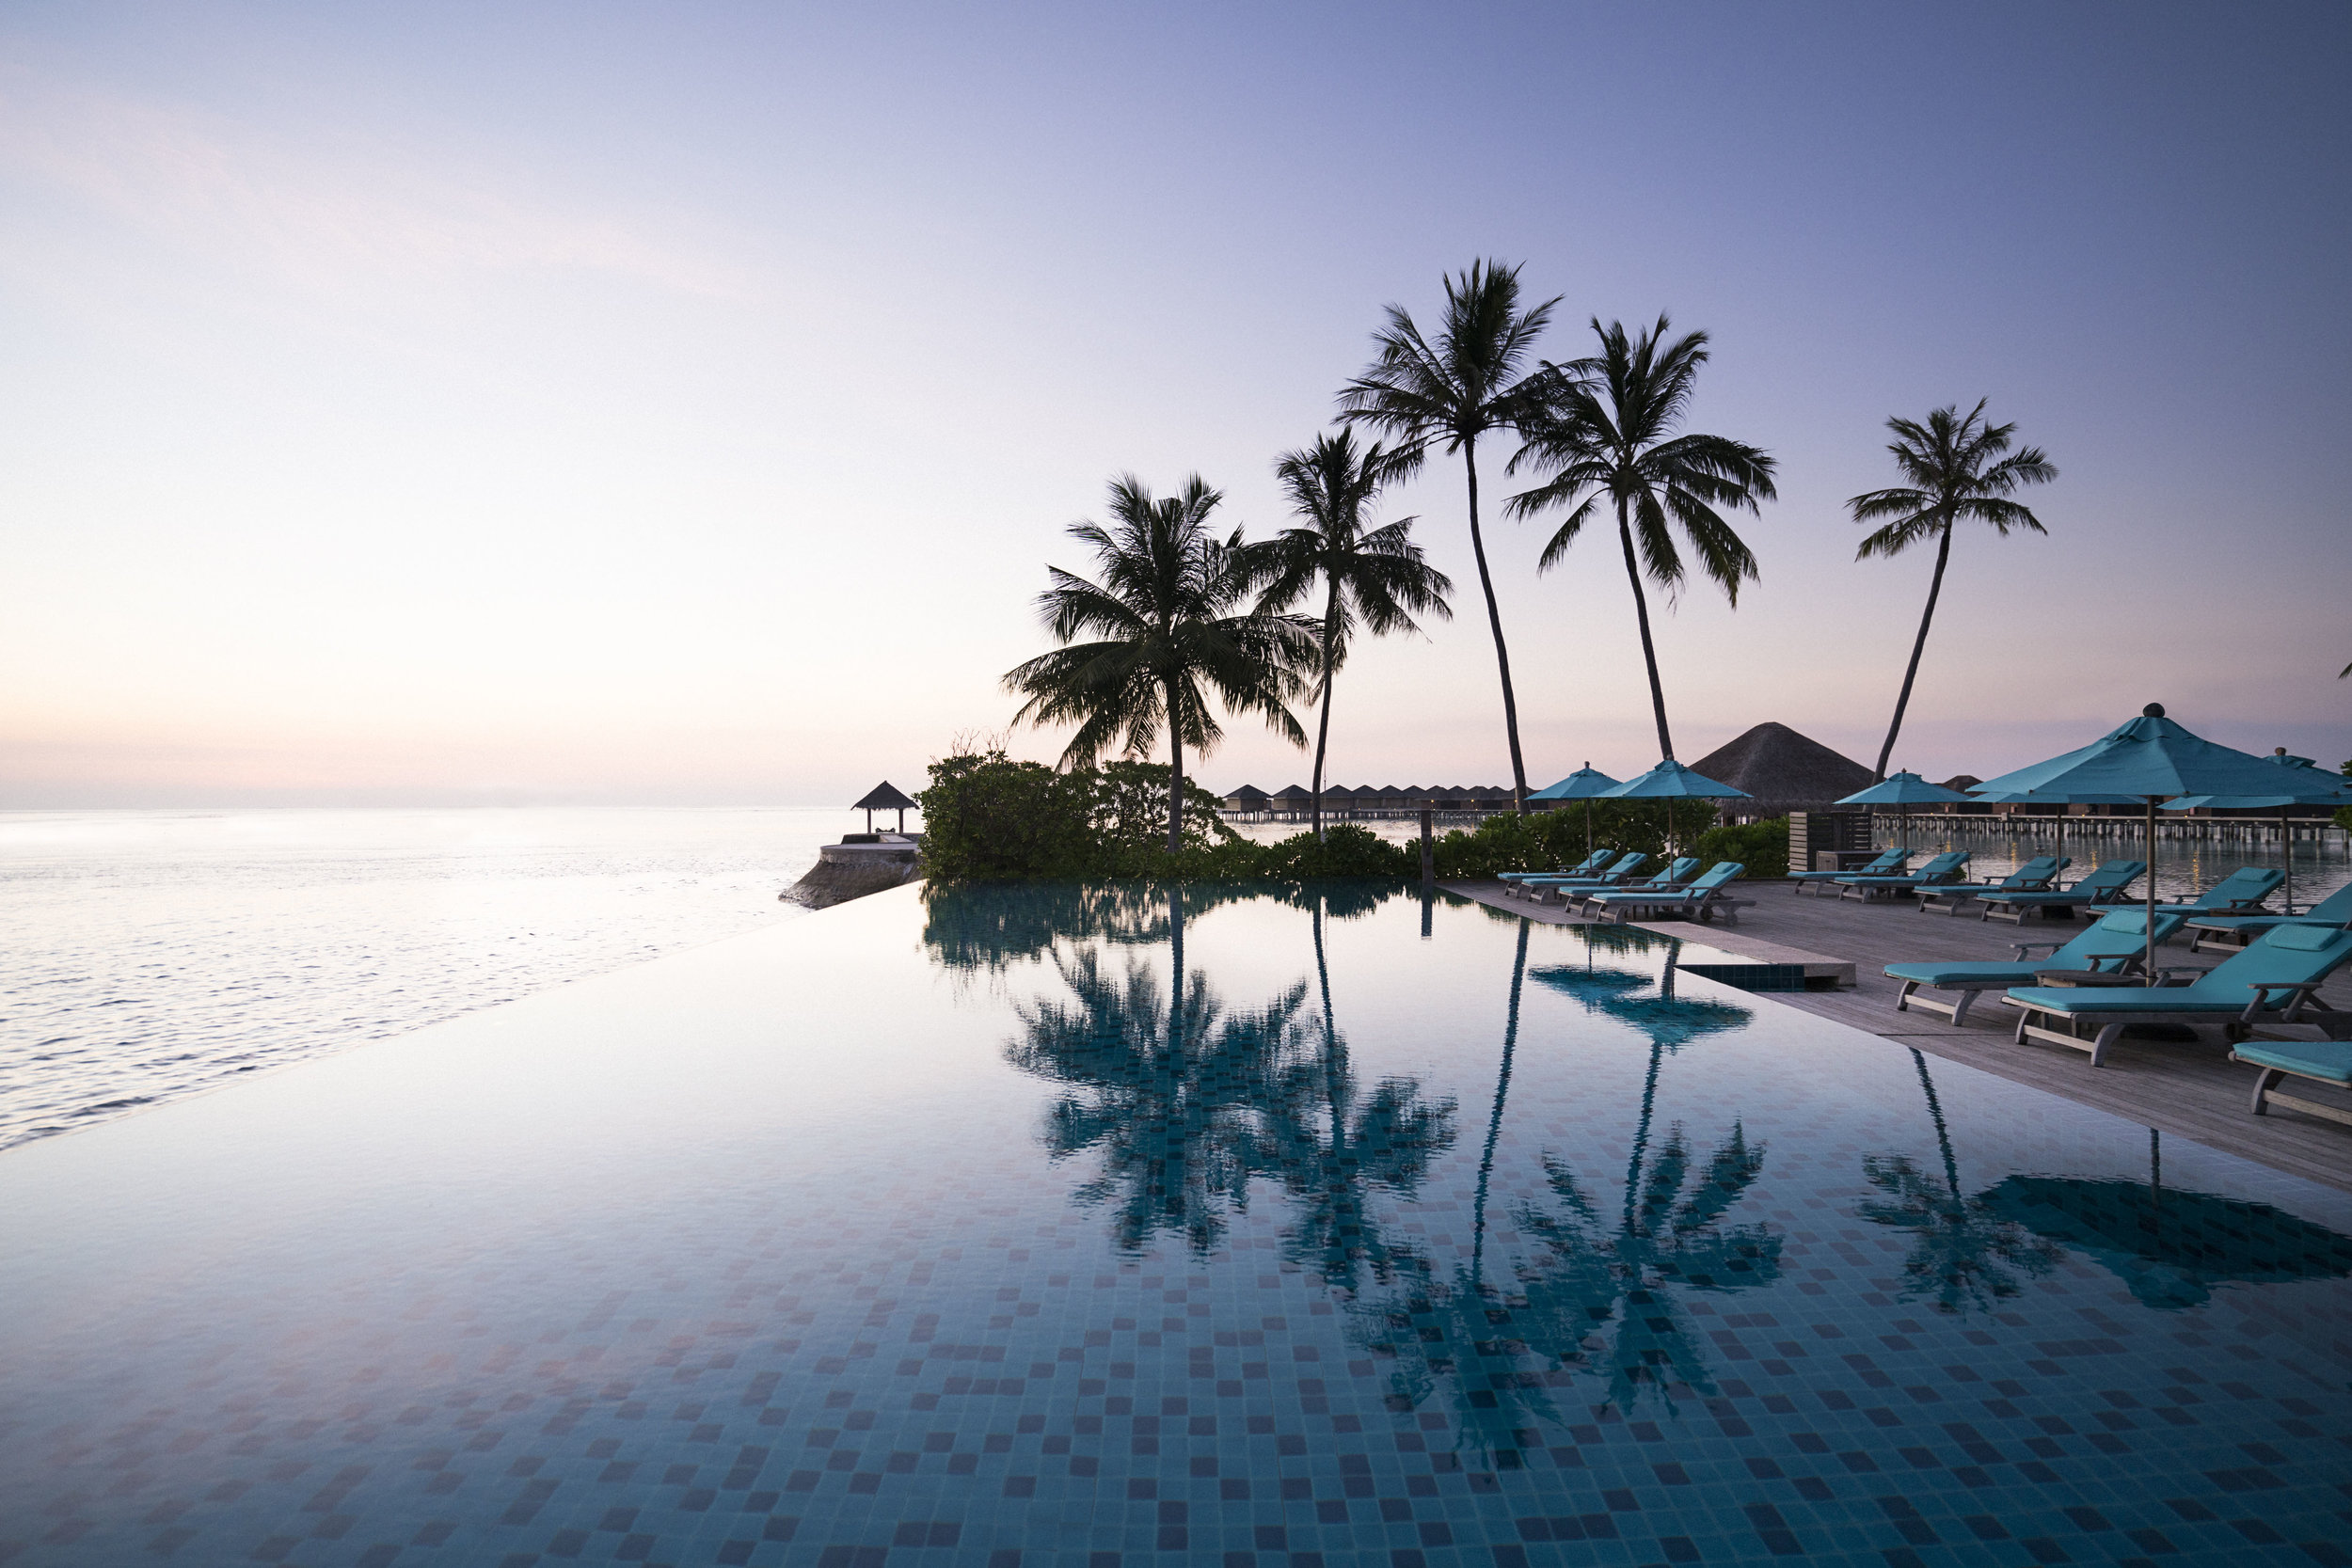 Anantara_Veli_Dhoni_Pool_Sunset.jpg